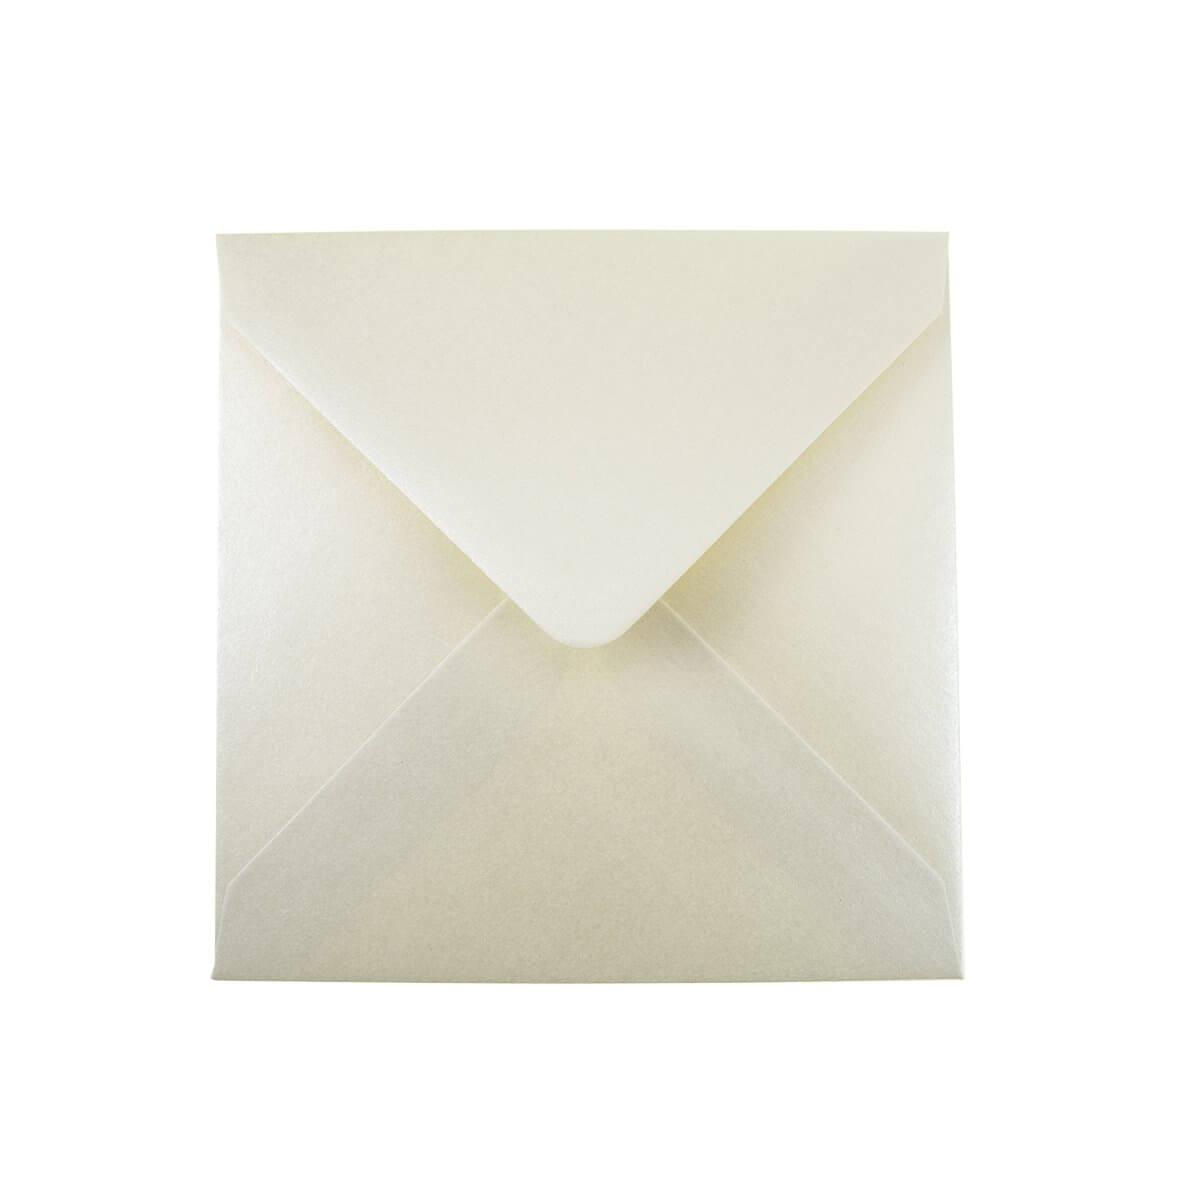 Vintage Ivory Small Square 130mm Envelopes